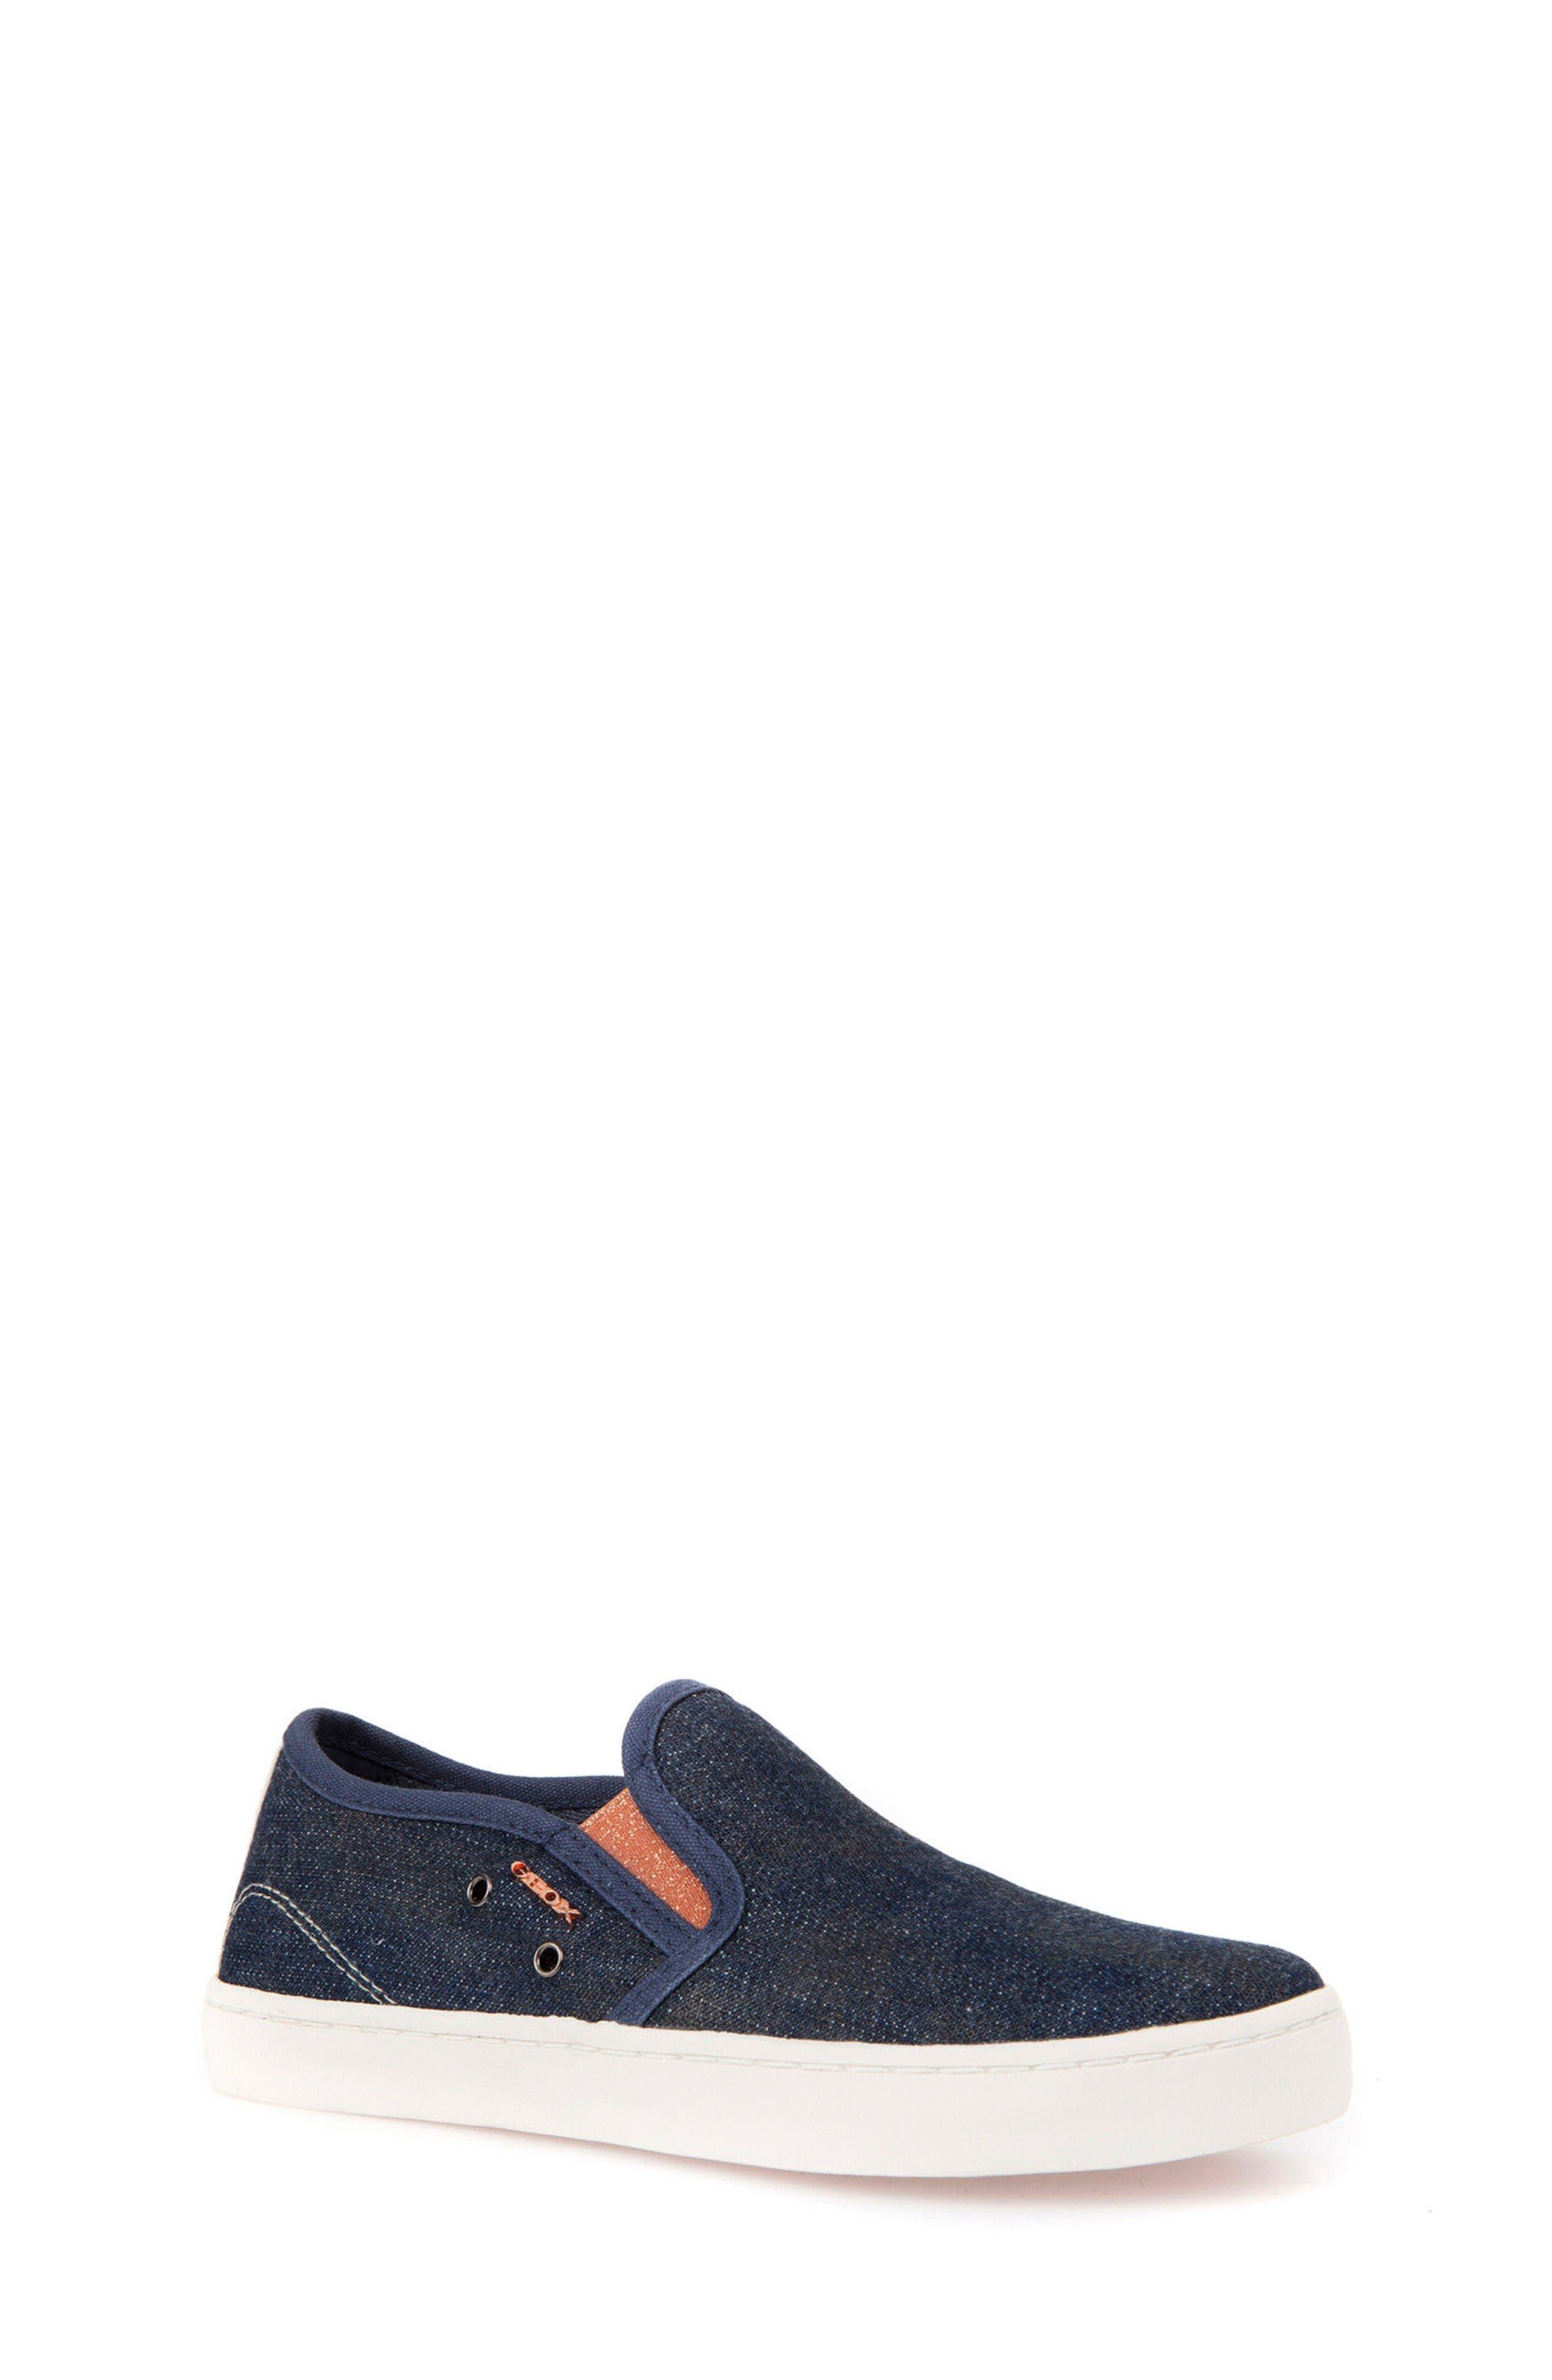 Jr Kiwi Slip-On Sneaker,                         Main,                         color, Jeans